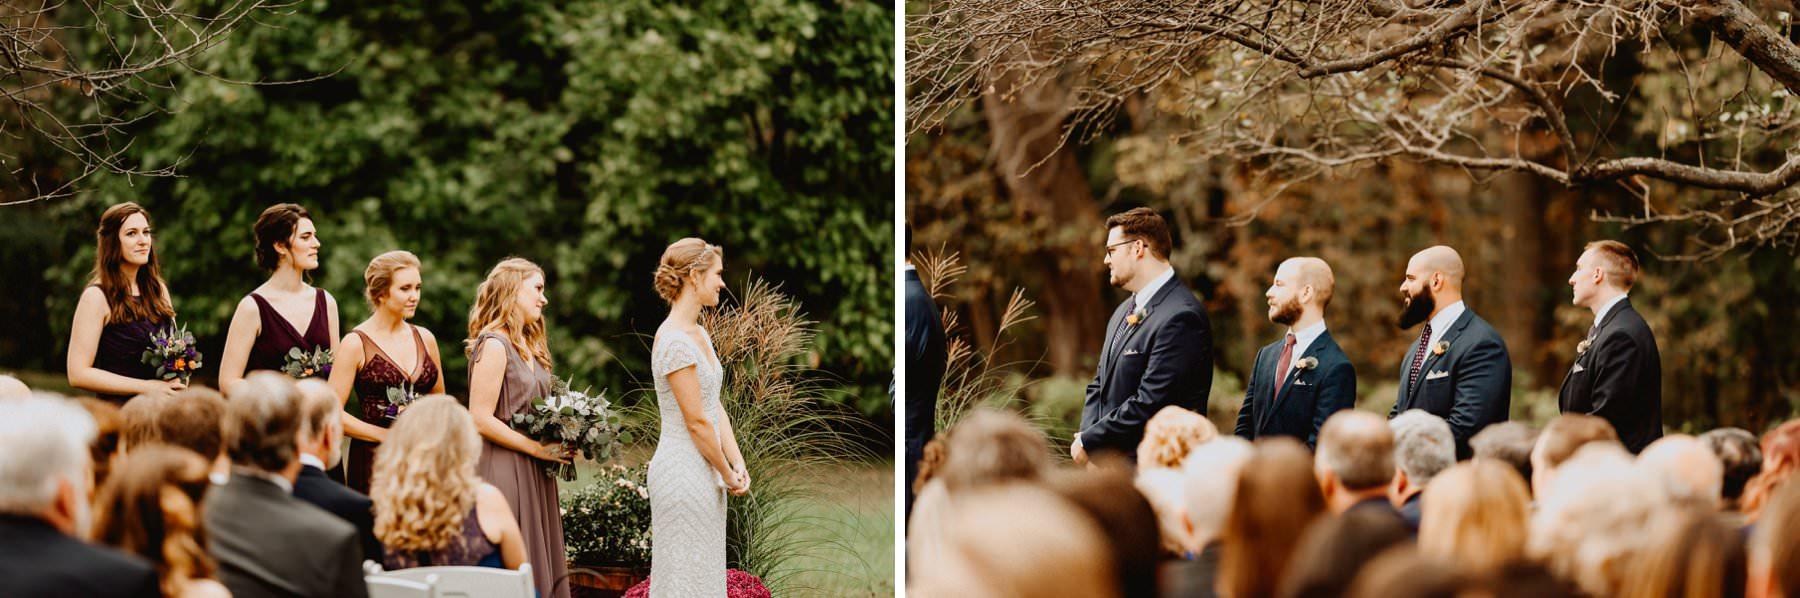 John_James_Audubon_Center_wedding-46.jpg